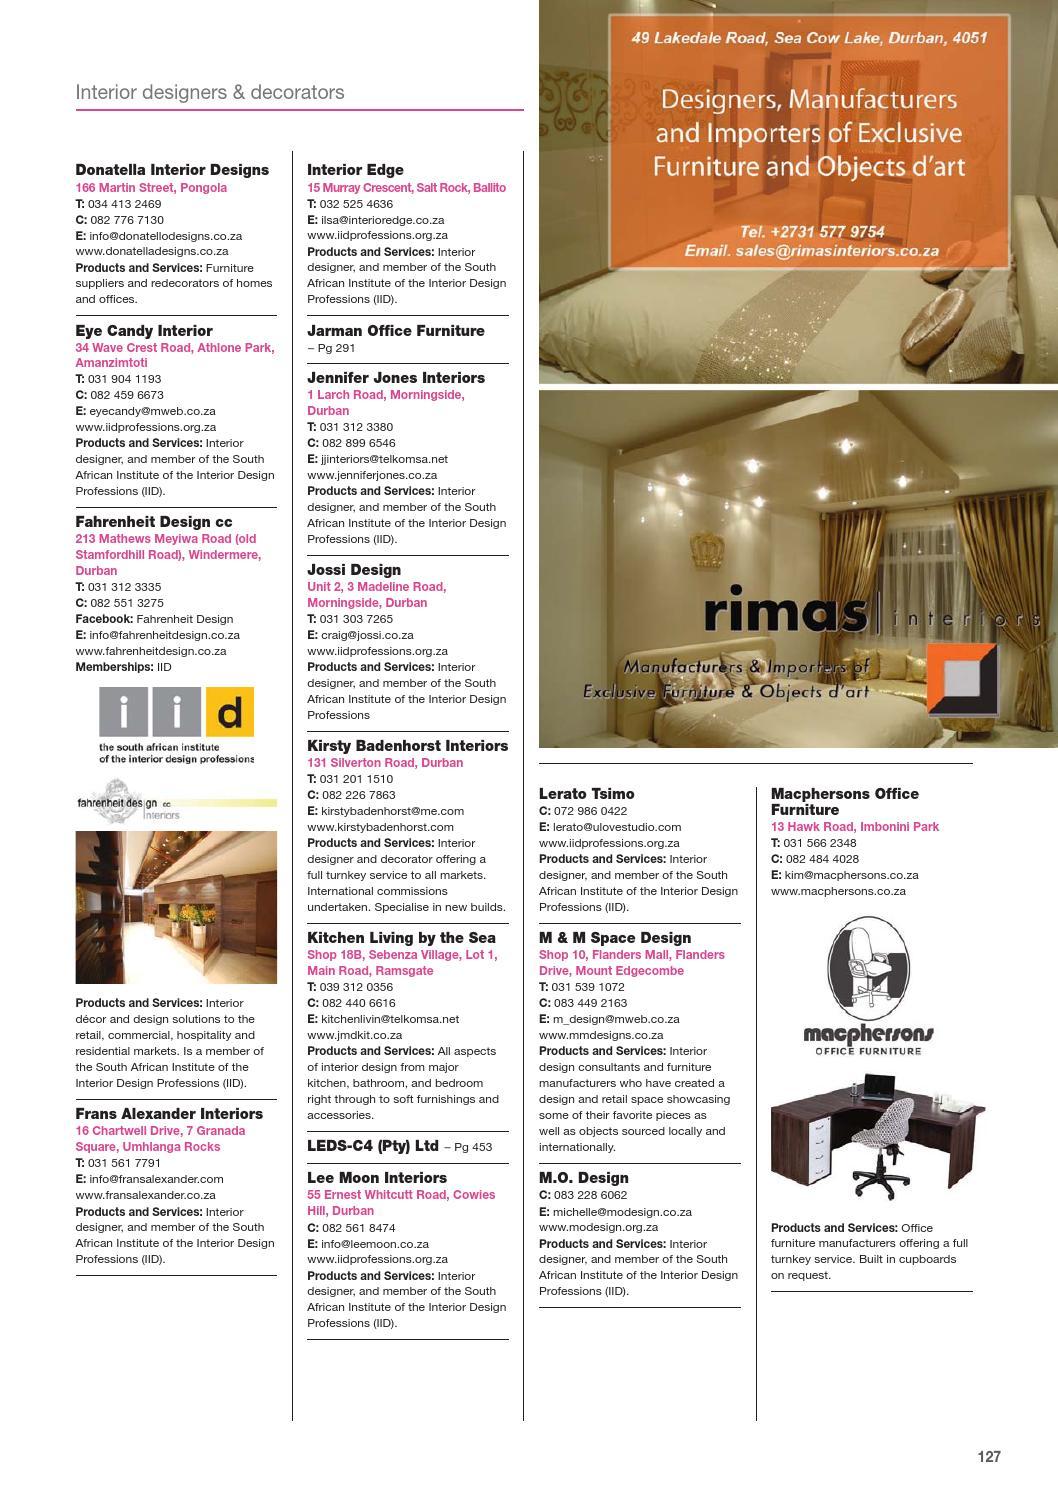 Sa Decor And Design The Buyers Guide 2016 Edition By Sa Decor Design Issuu